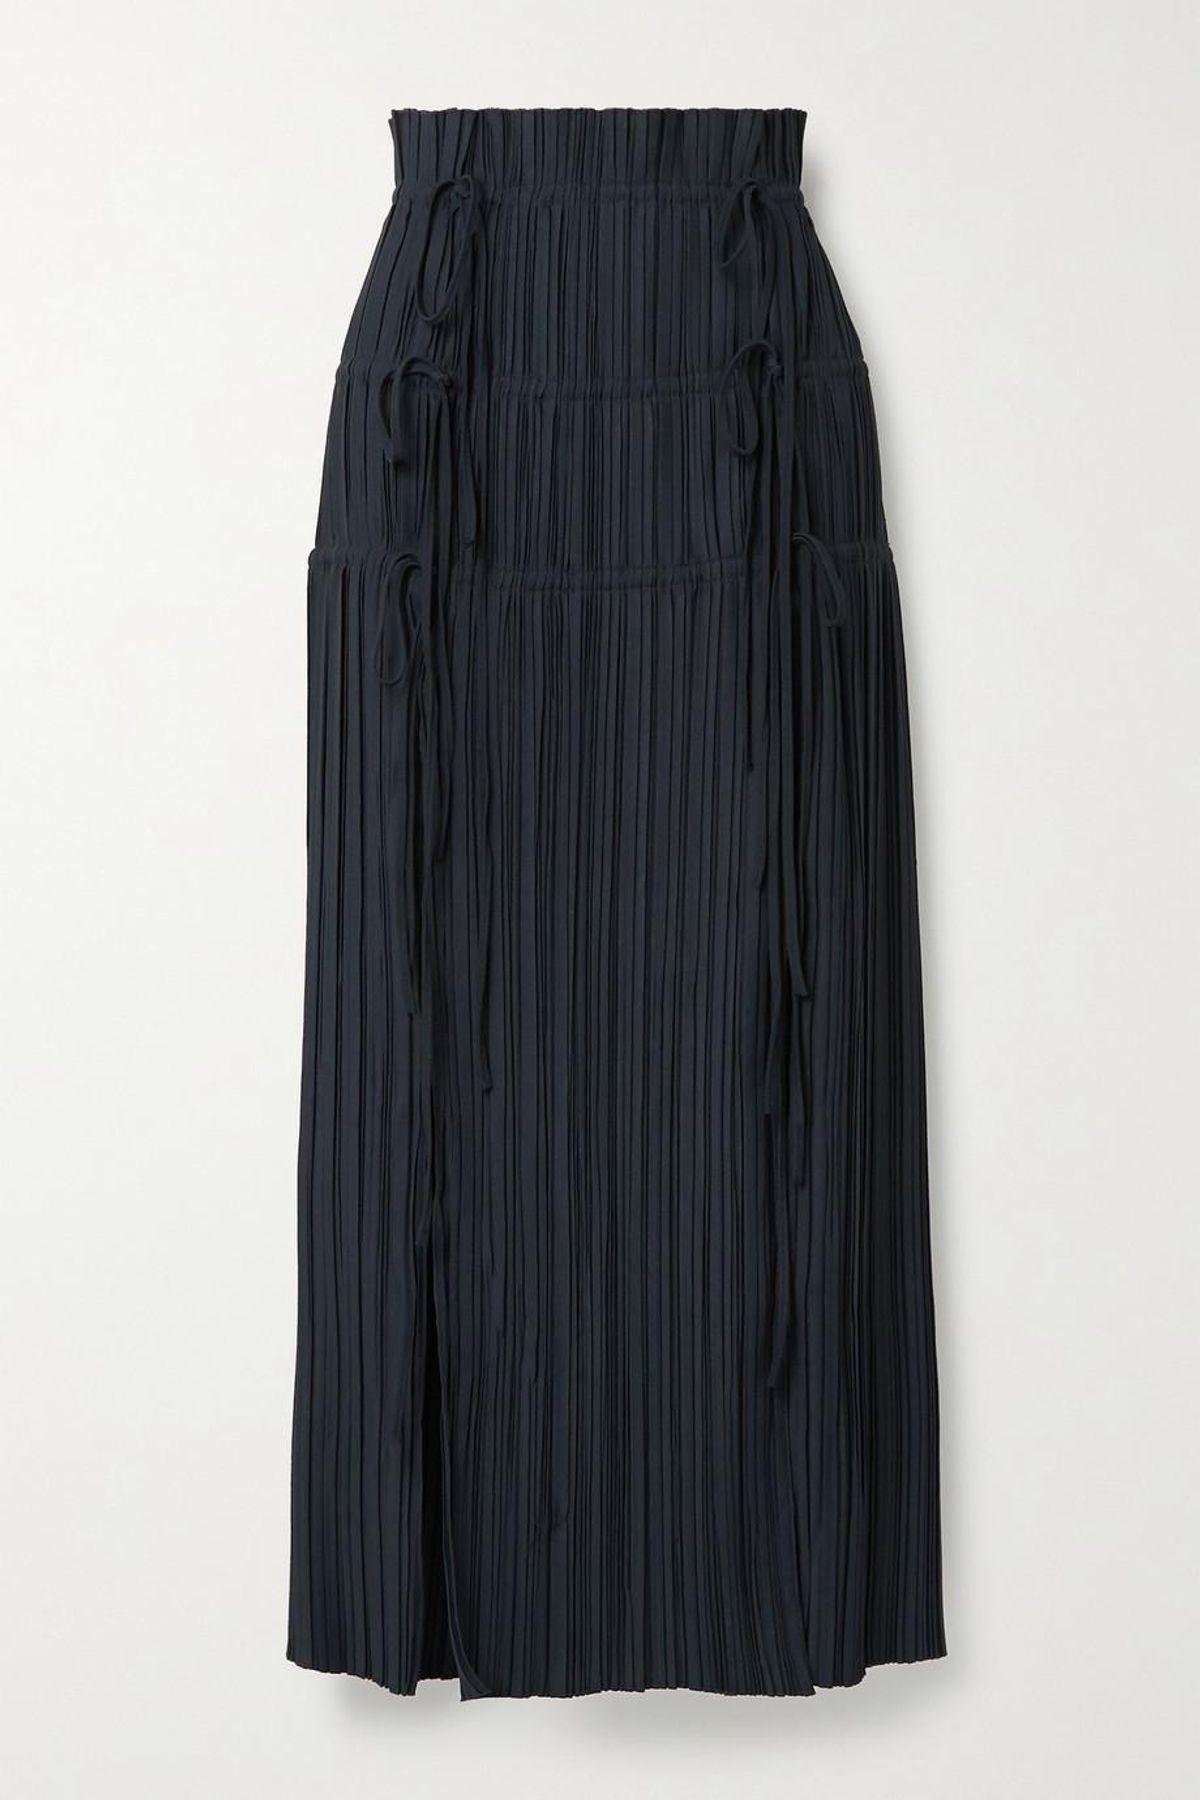 Tie-Detailed Plisse Crepe Maxi Skirt